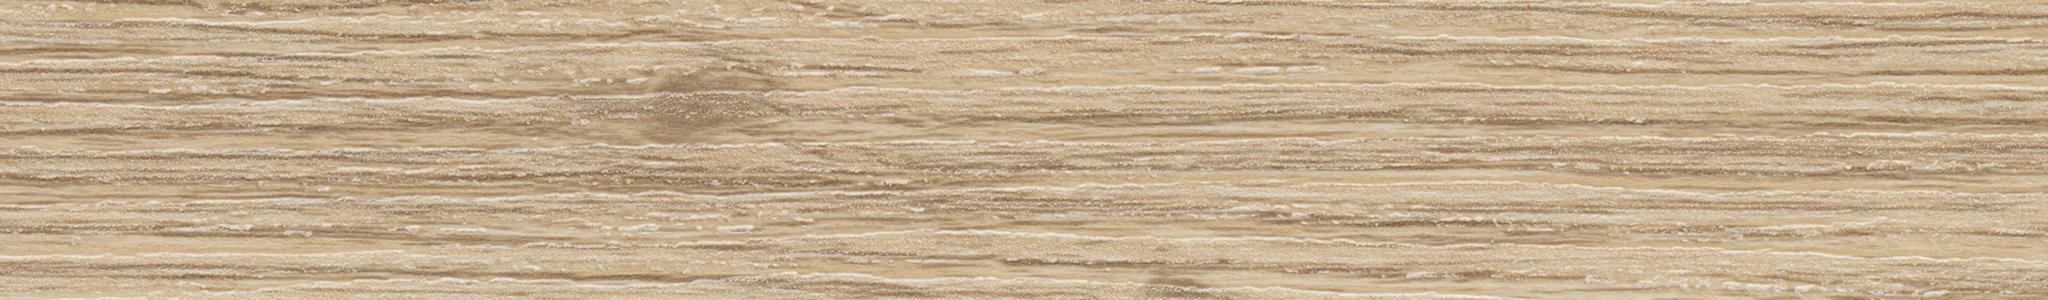 HD 244057 ABS Edge Canadian Oak Pore